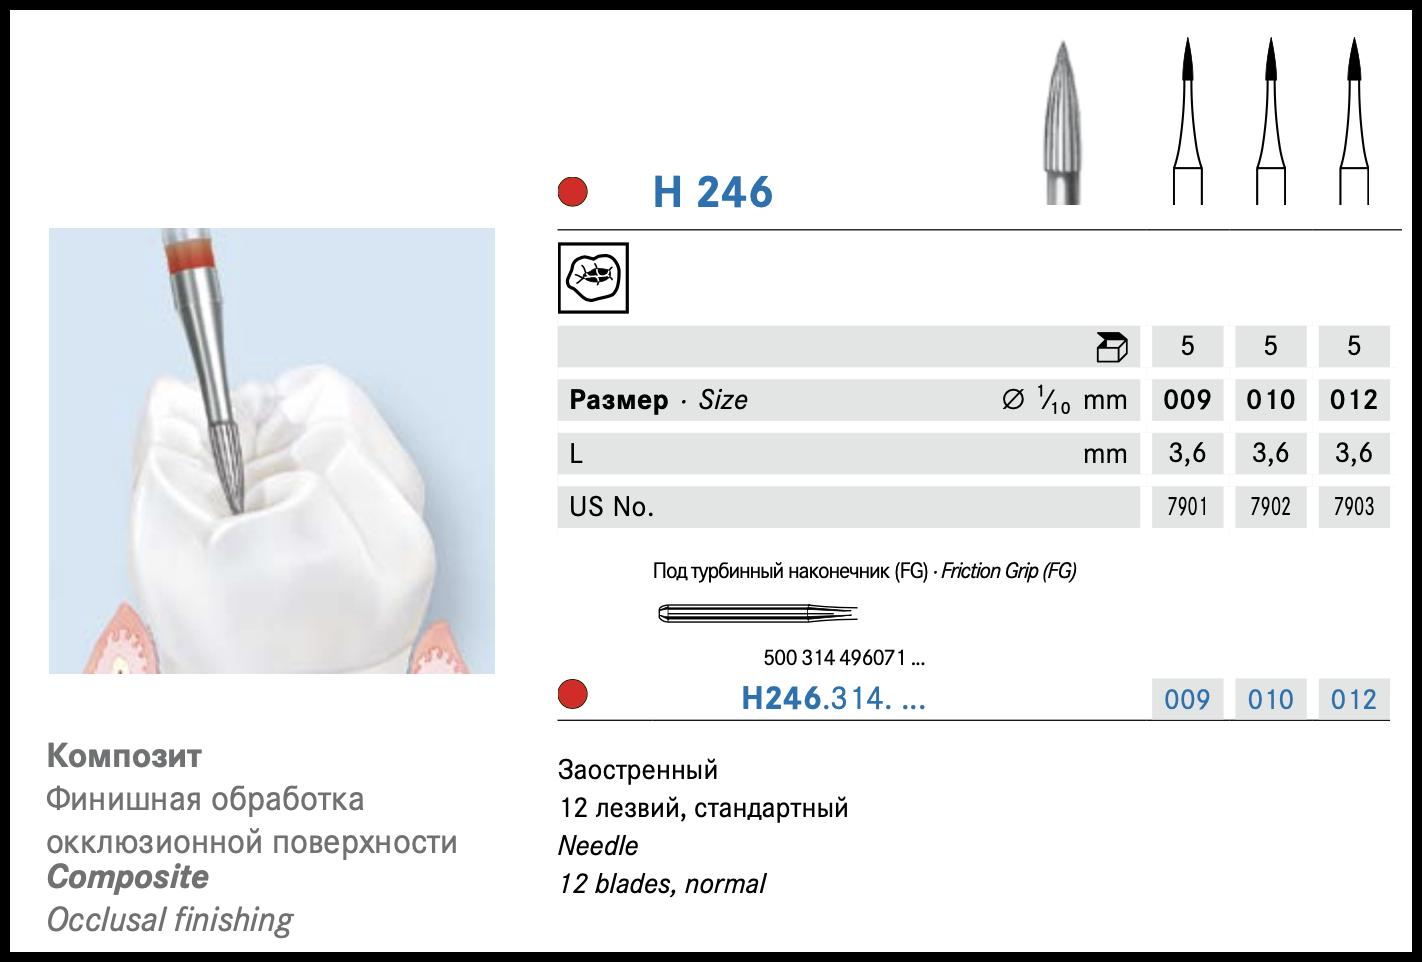 Freza extradura H246 / 204 RA (piesa unghi)